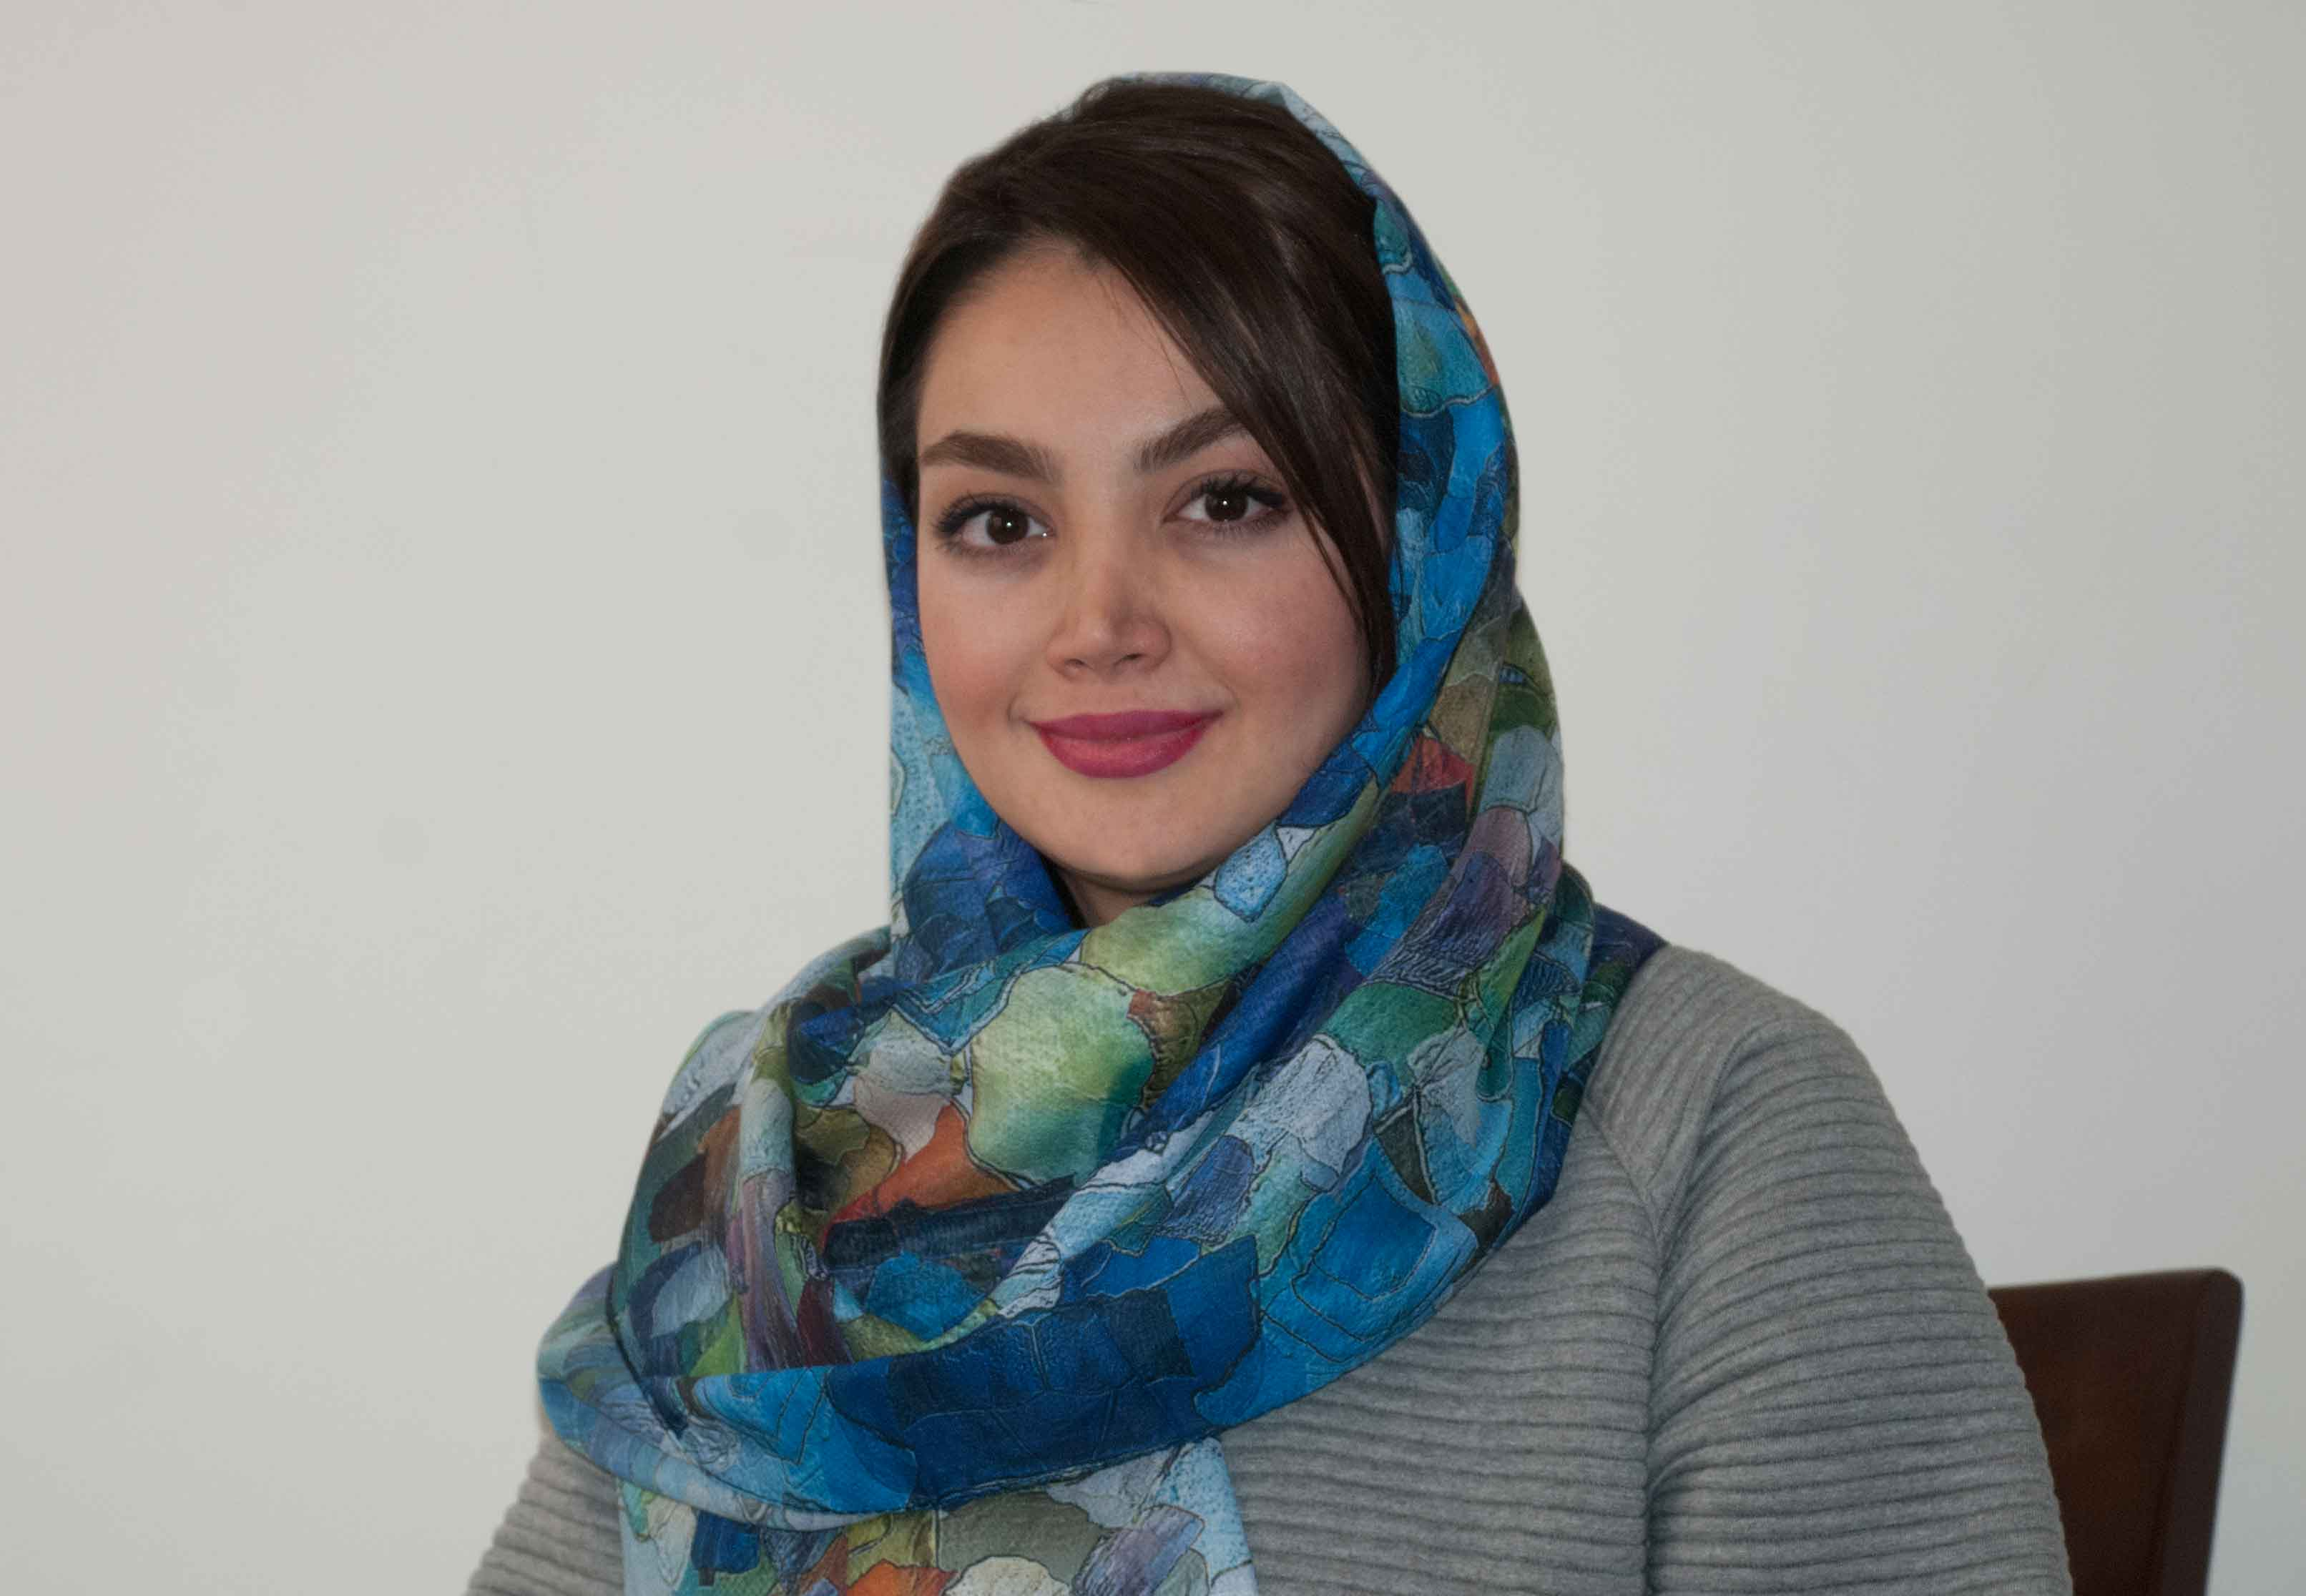 دکتر-عسل-ناجیان - متخصص مشاوره نوجوان اکسیر